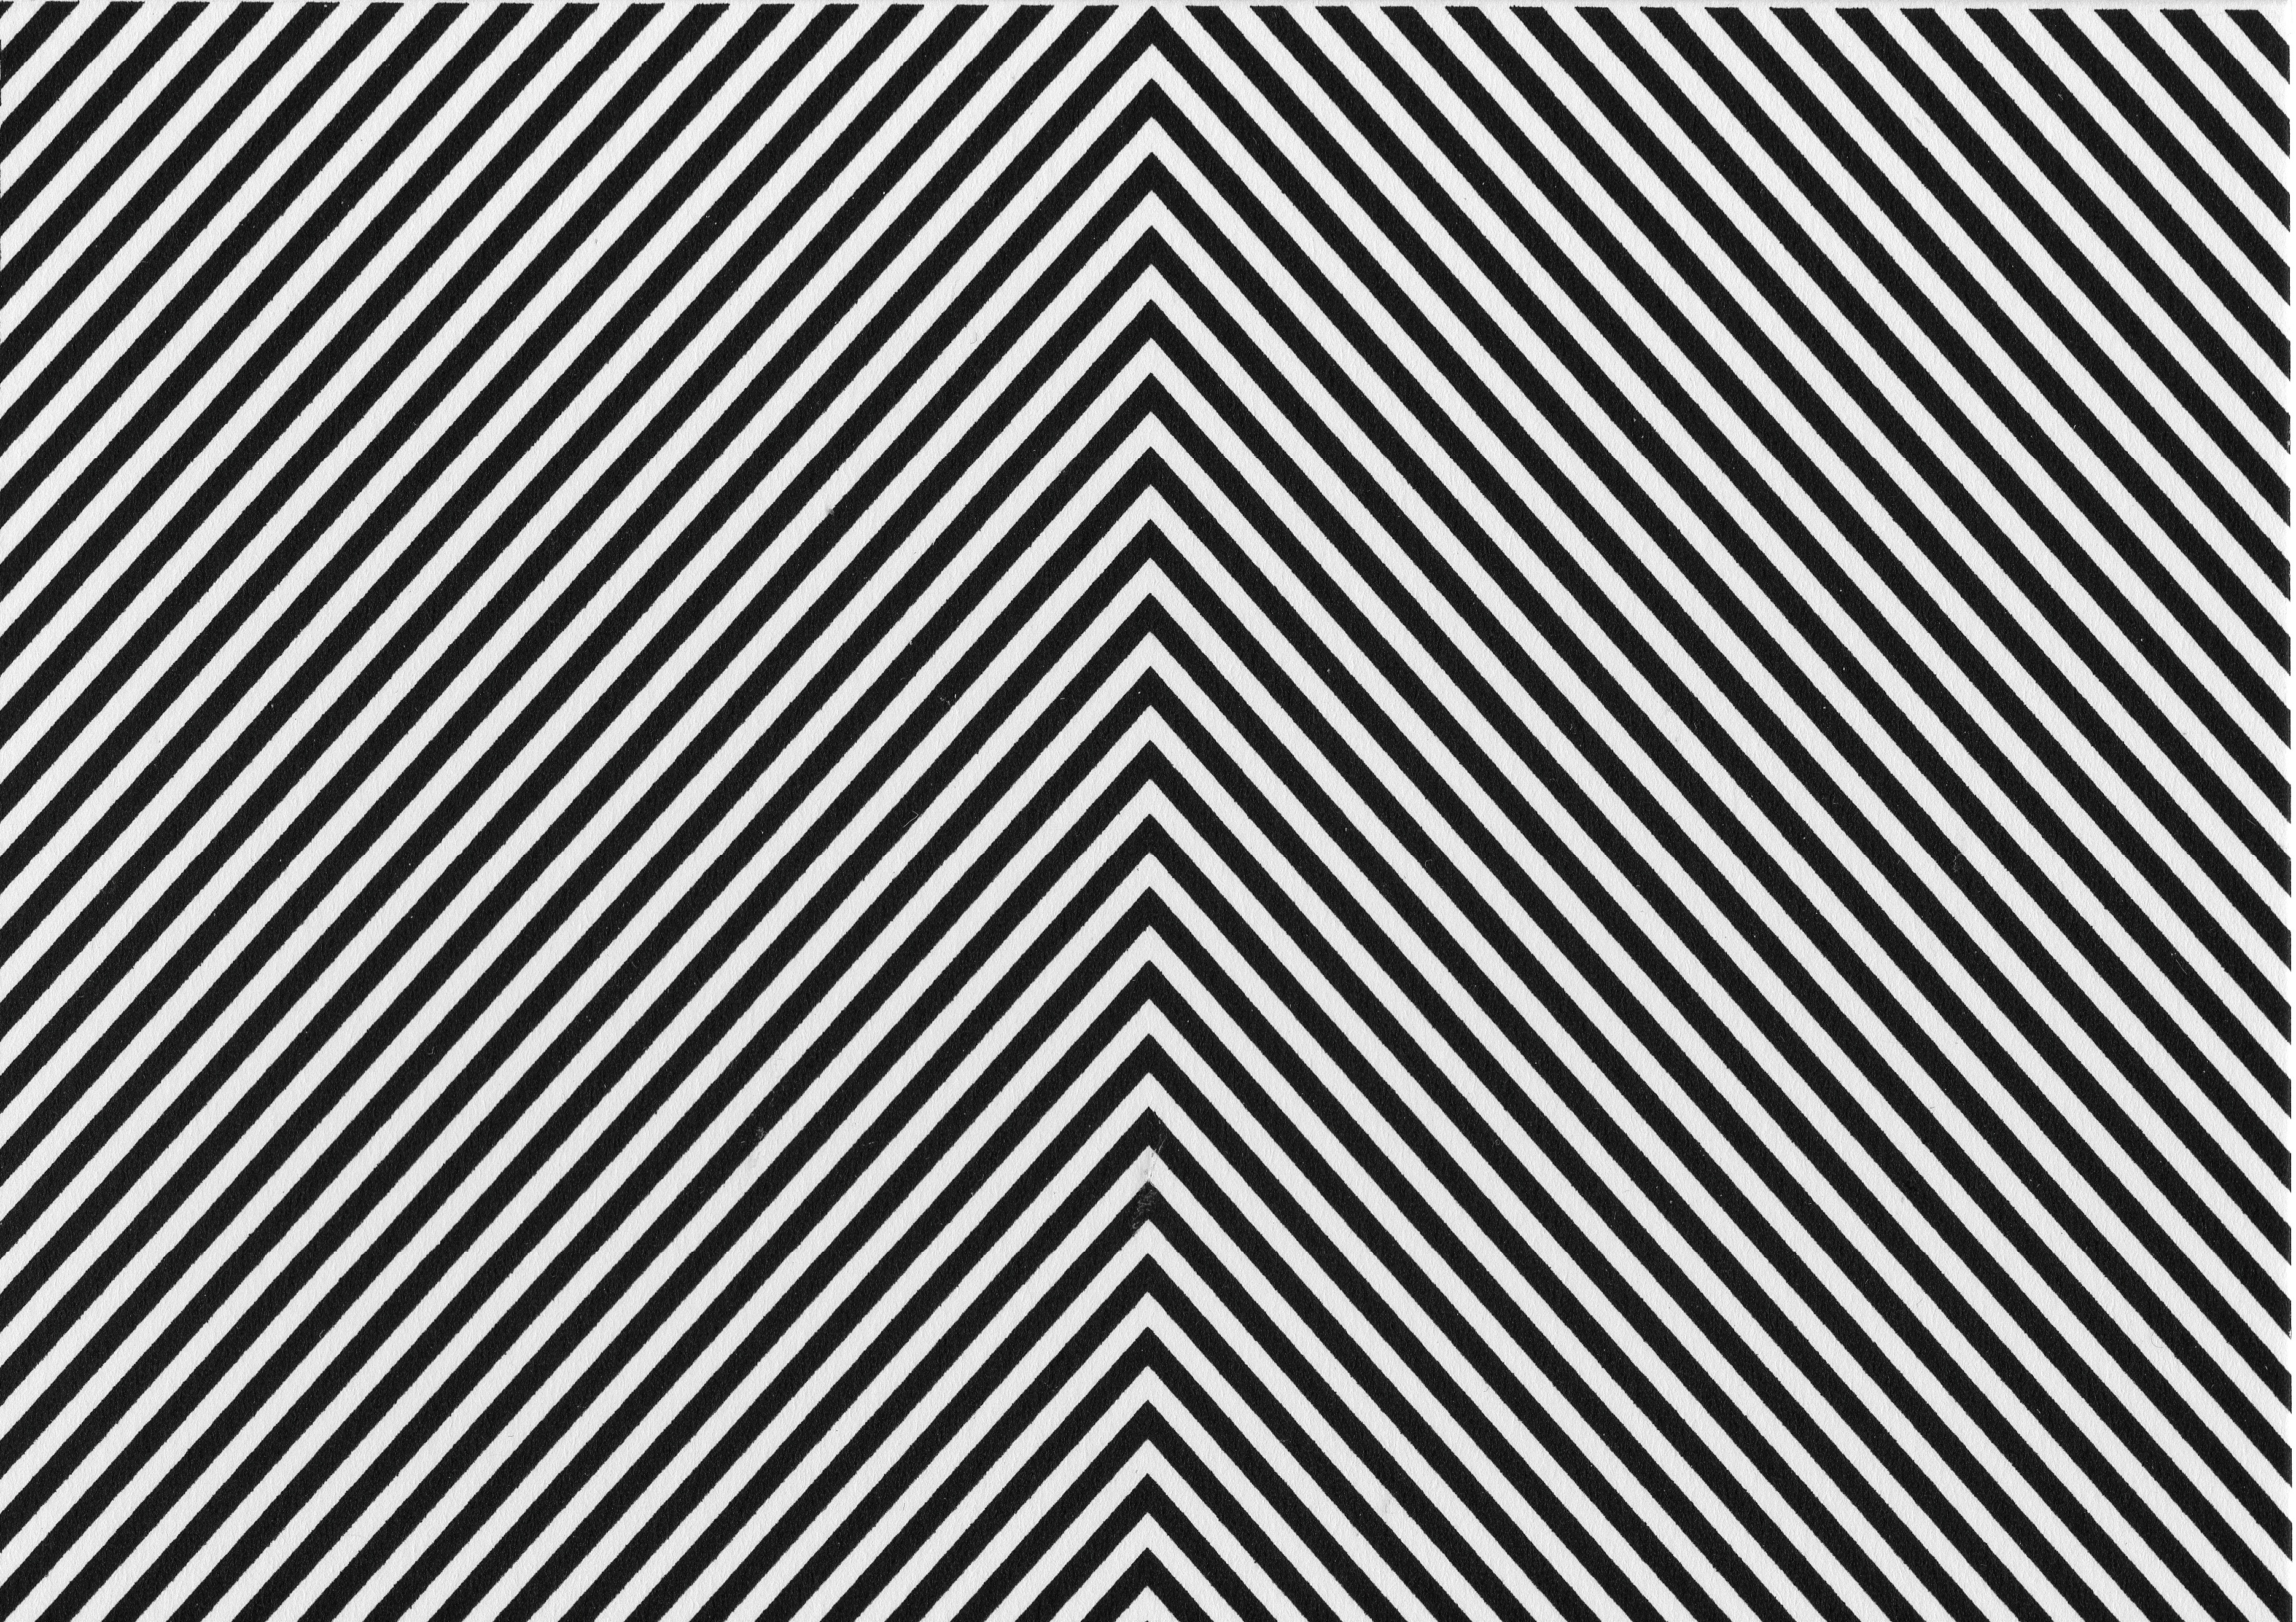 Wallpaper Illusion 3d Screenprinting Math Op Art At Kayrock Screenprinting